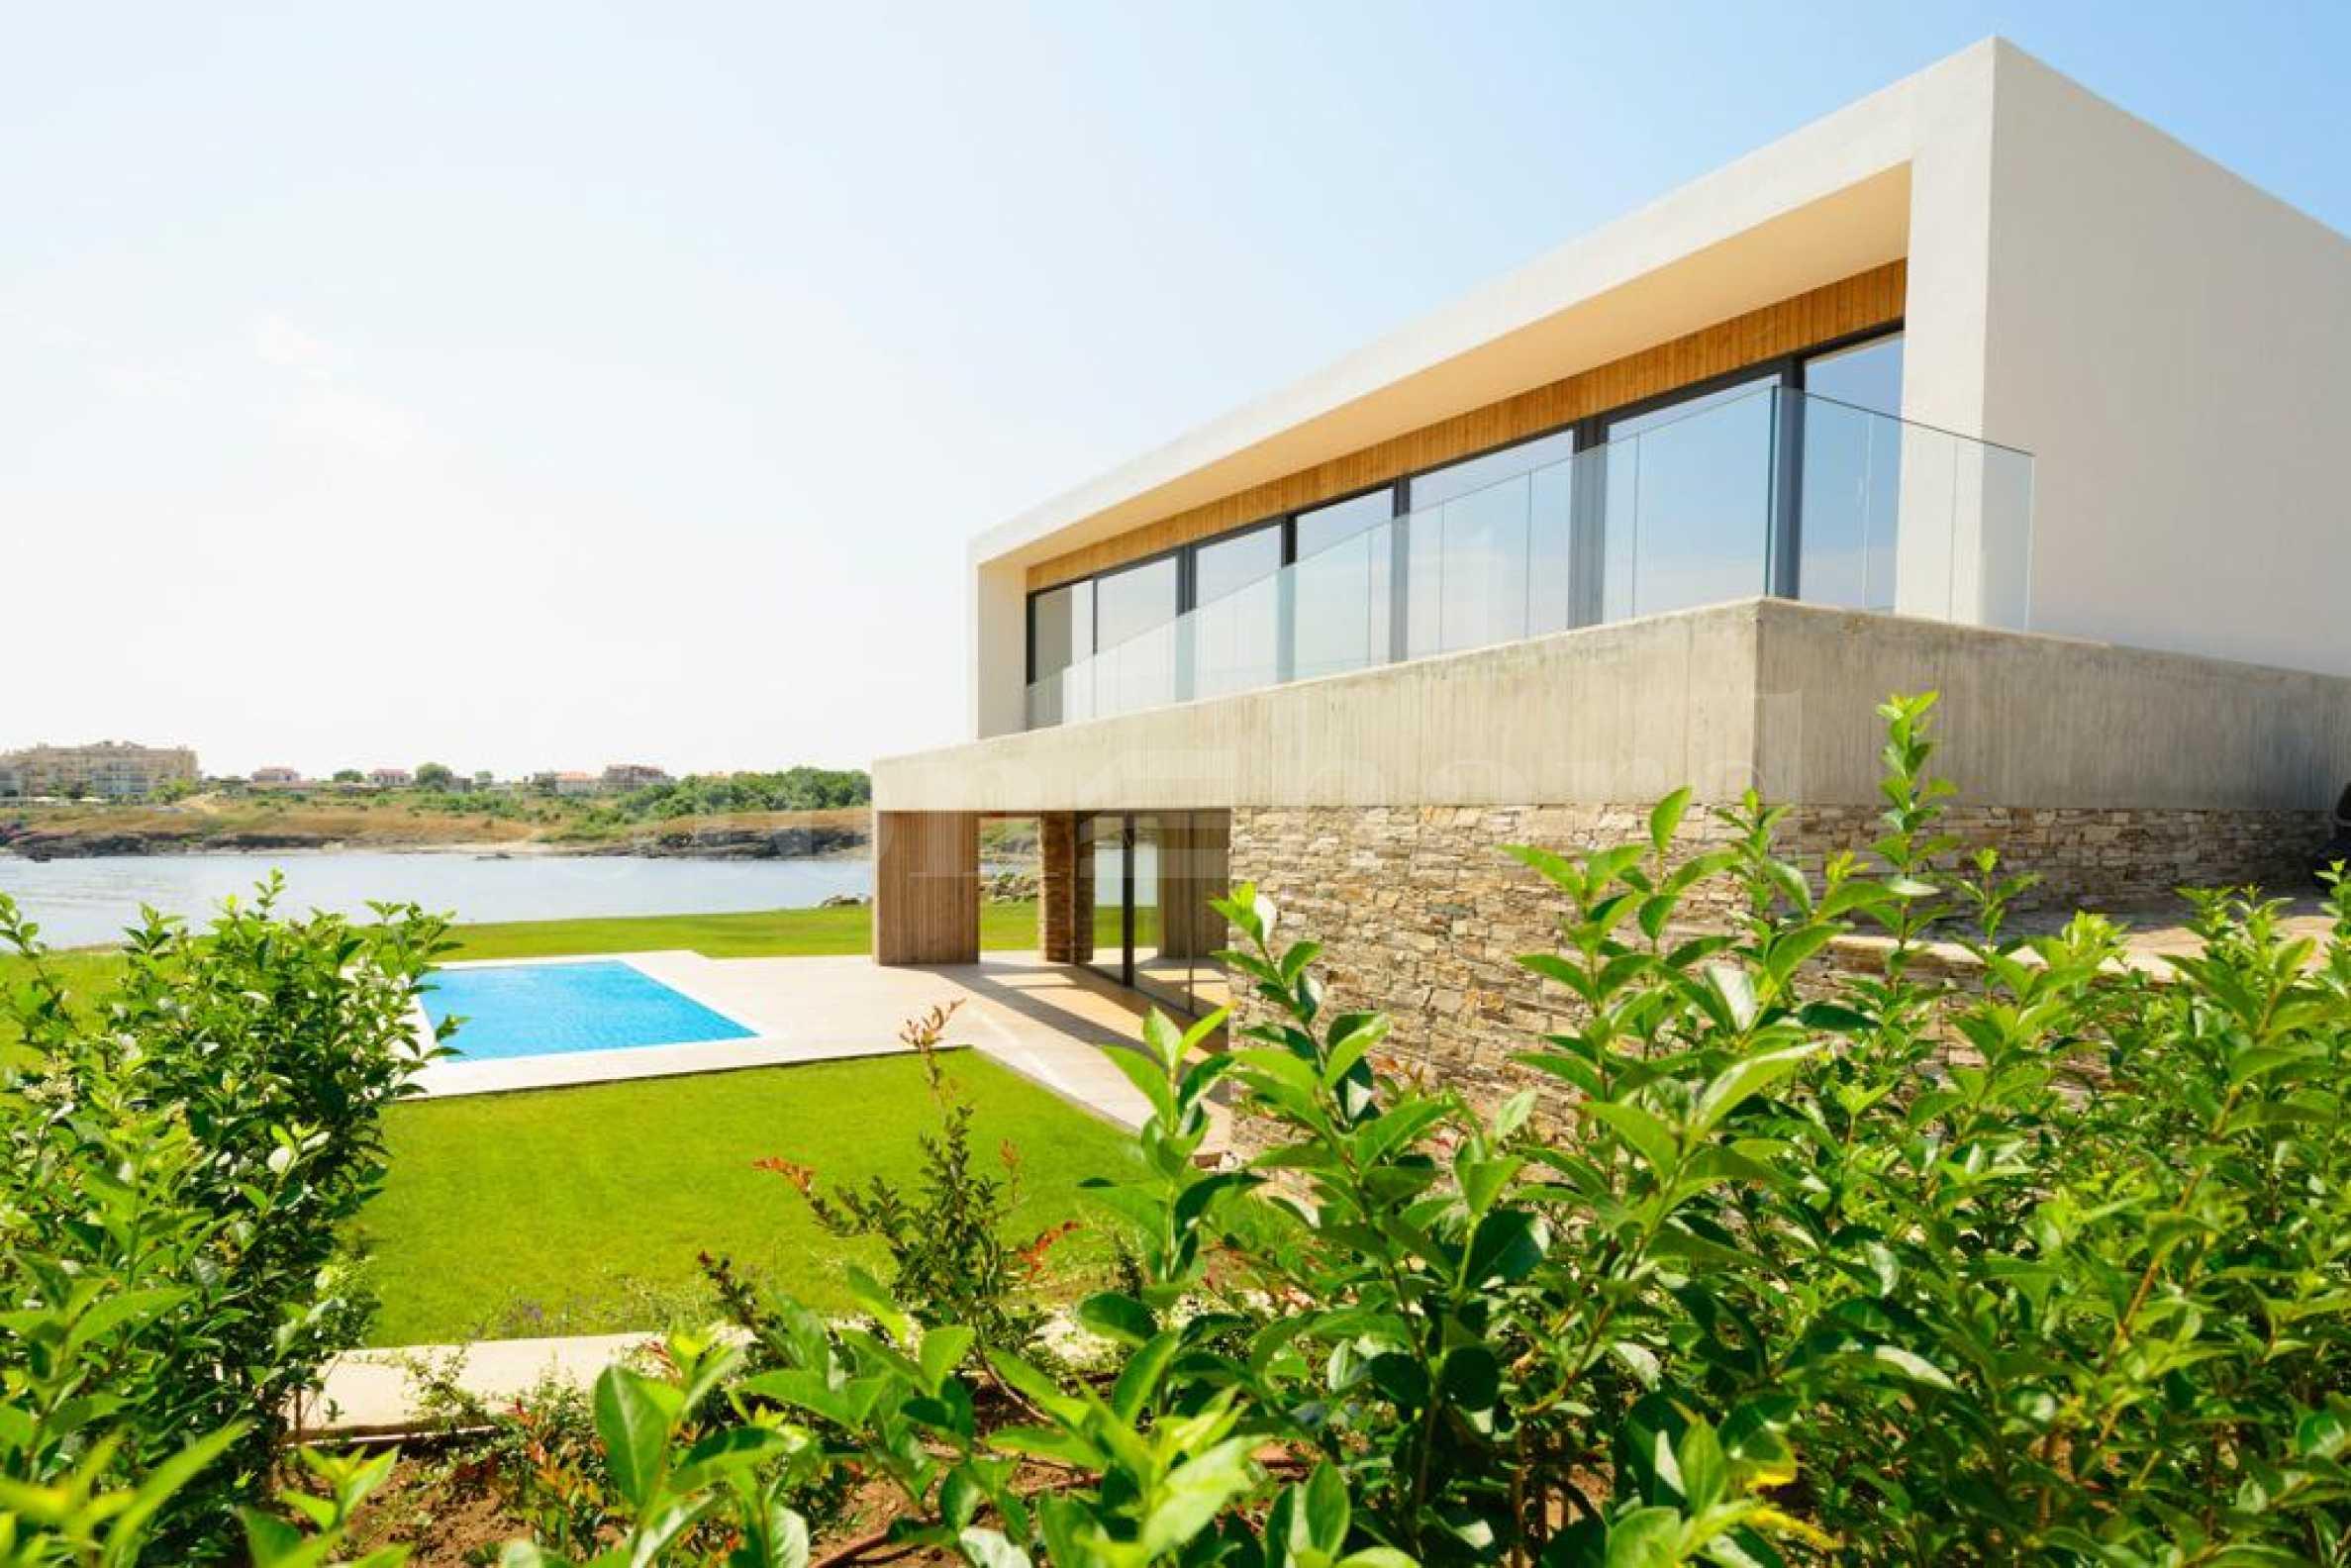 Turn-key villa on the beach in a quiet area near Lozenets1 - Stonehard